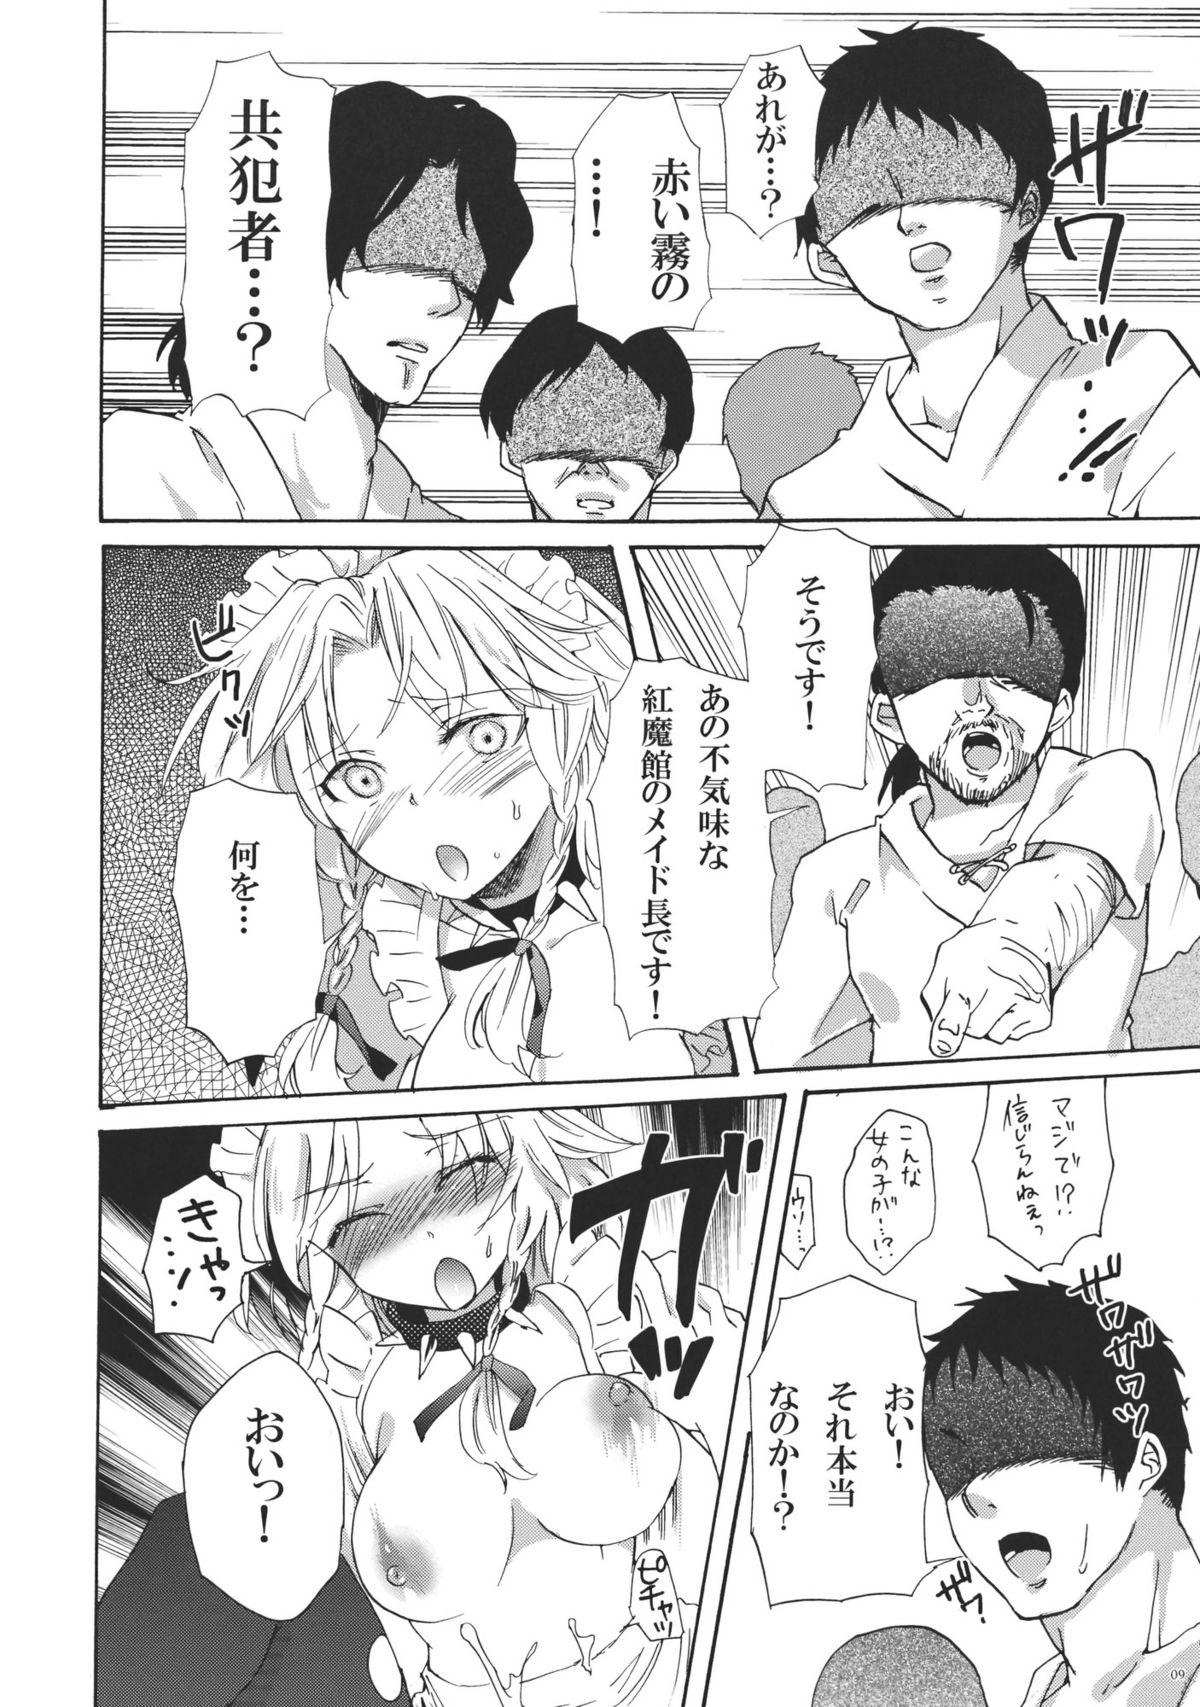 Inu ni Natta Sakuya-san Ge 8